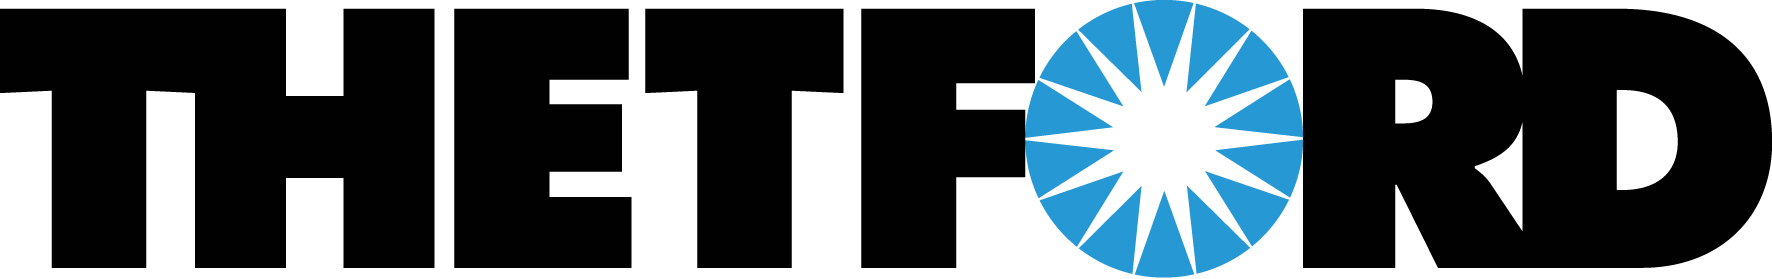 Thetford_Logo_www_cmyk